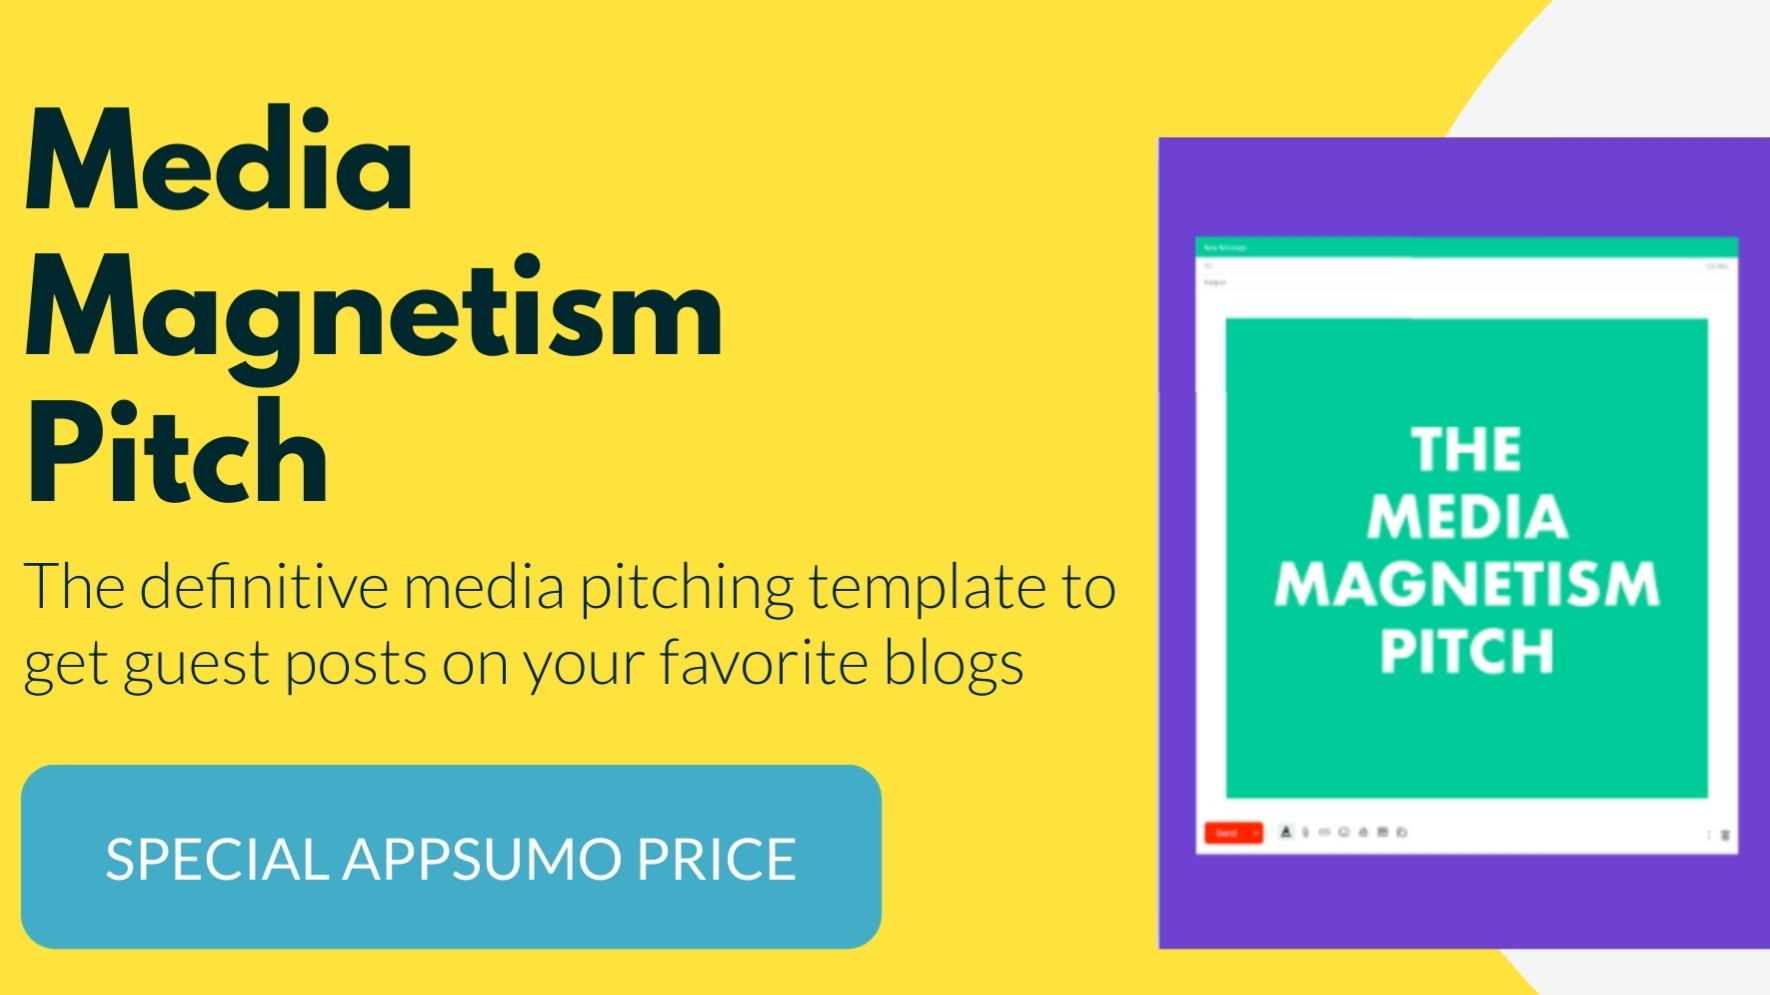 AppSumo Deal for Media Magnetism Pitch